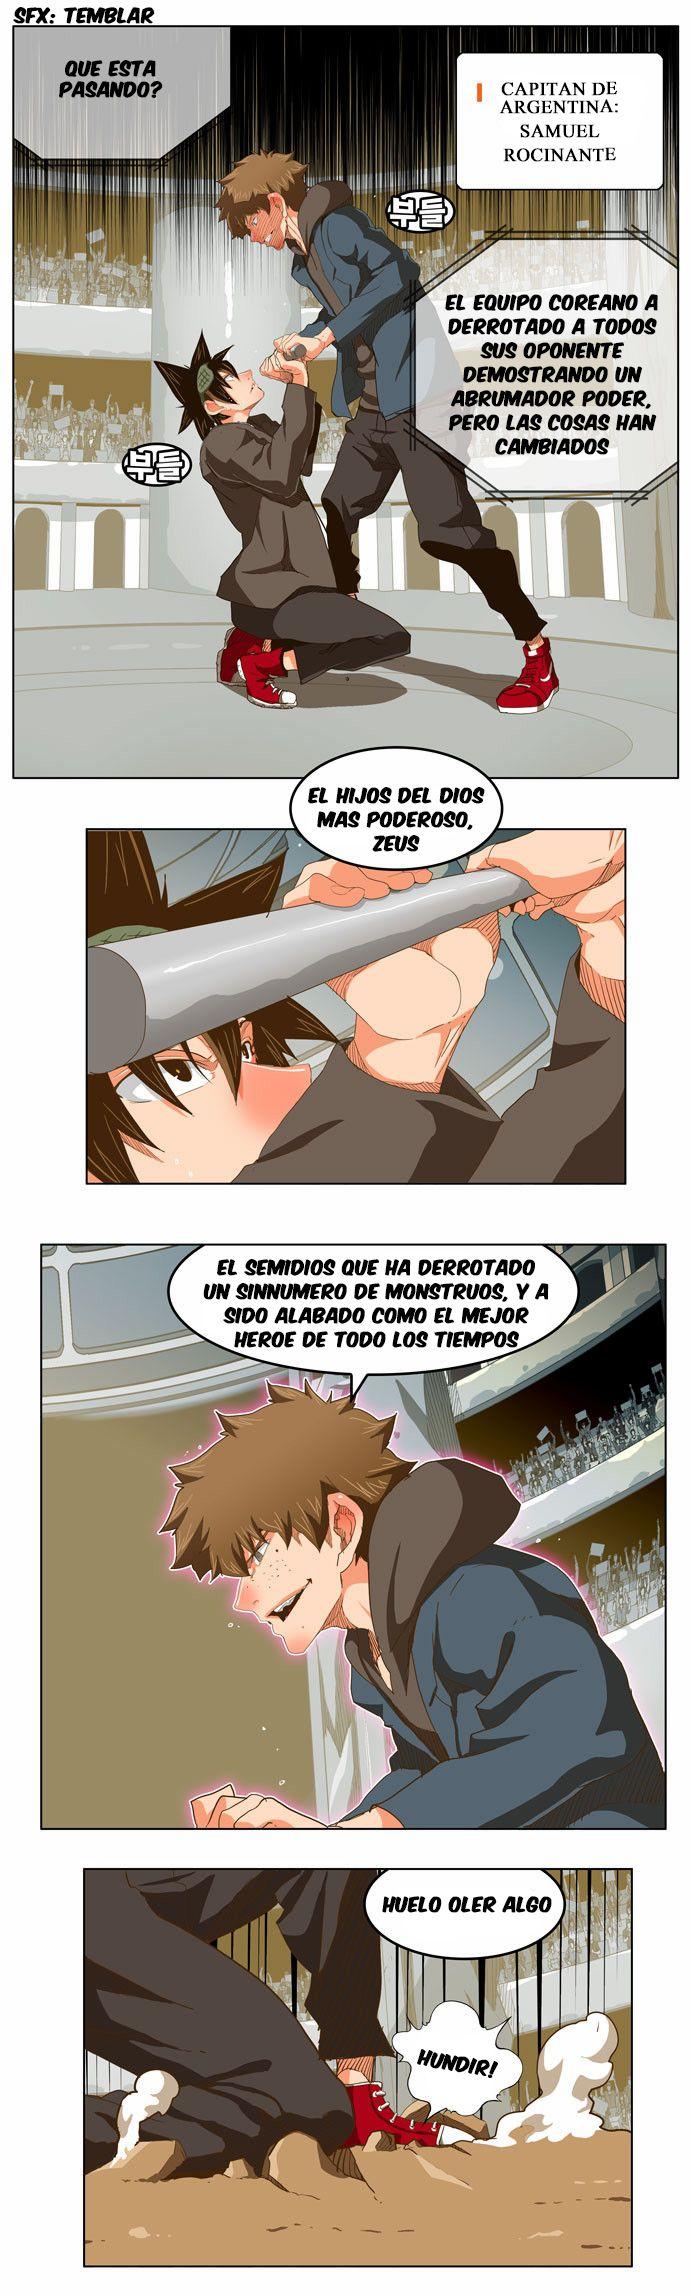 http://c5.ninemanga.com/es_manga/37/485/456291/e997d64448e4f1b698c98432ea82a5ae.jpg Page 7